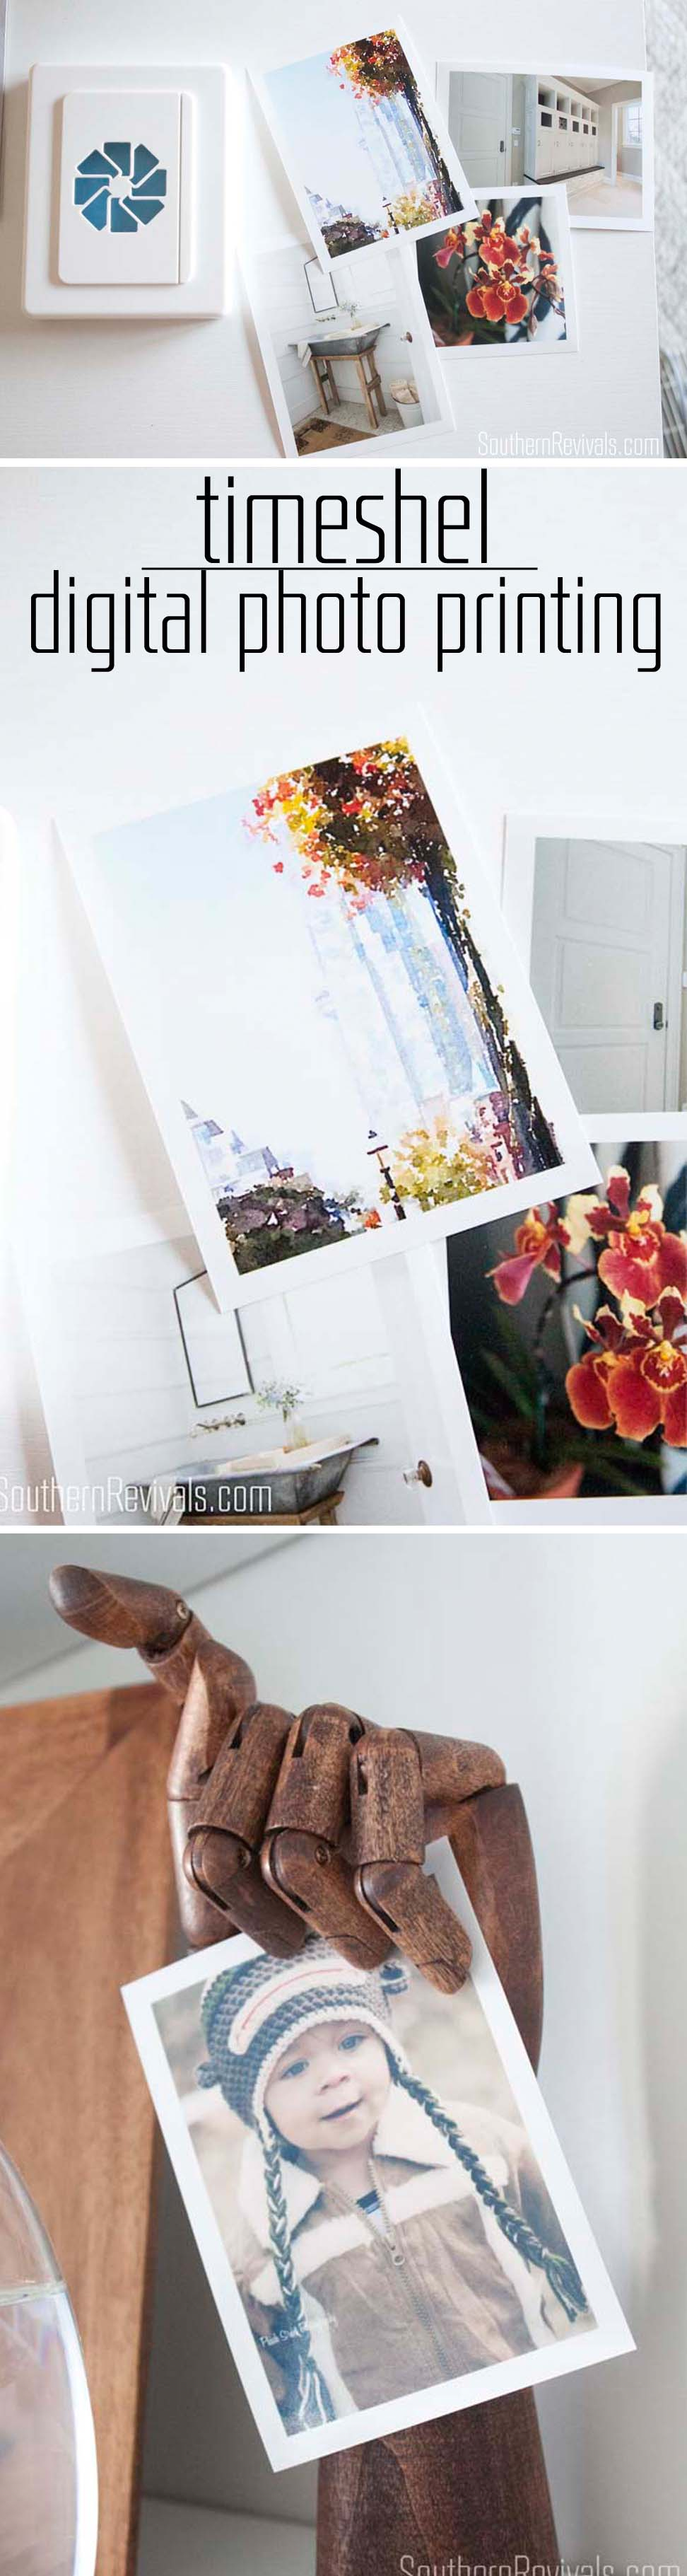 timeshel   Digital Photo Printing Services + easy DIY photo frame ideas